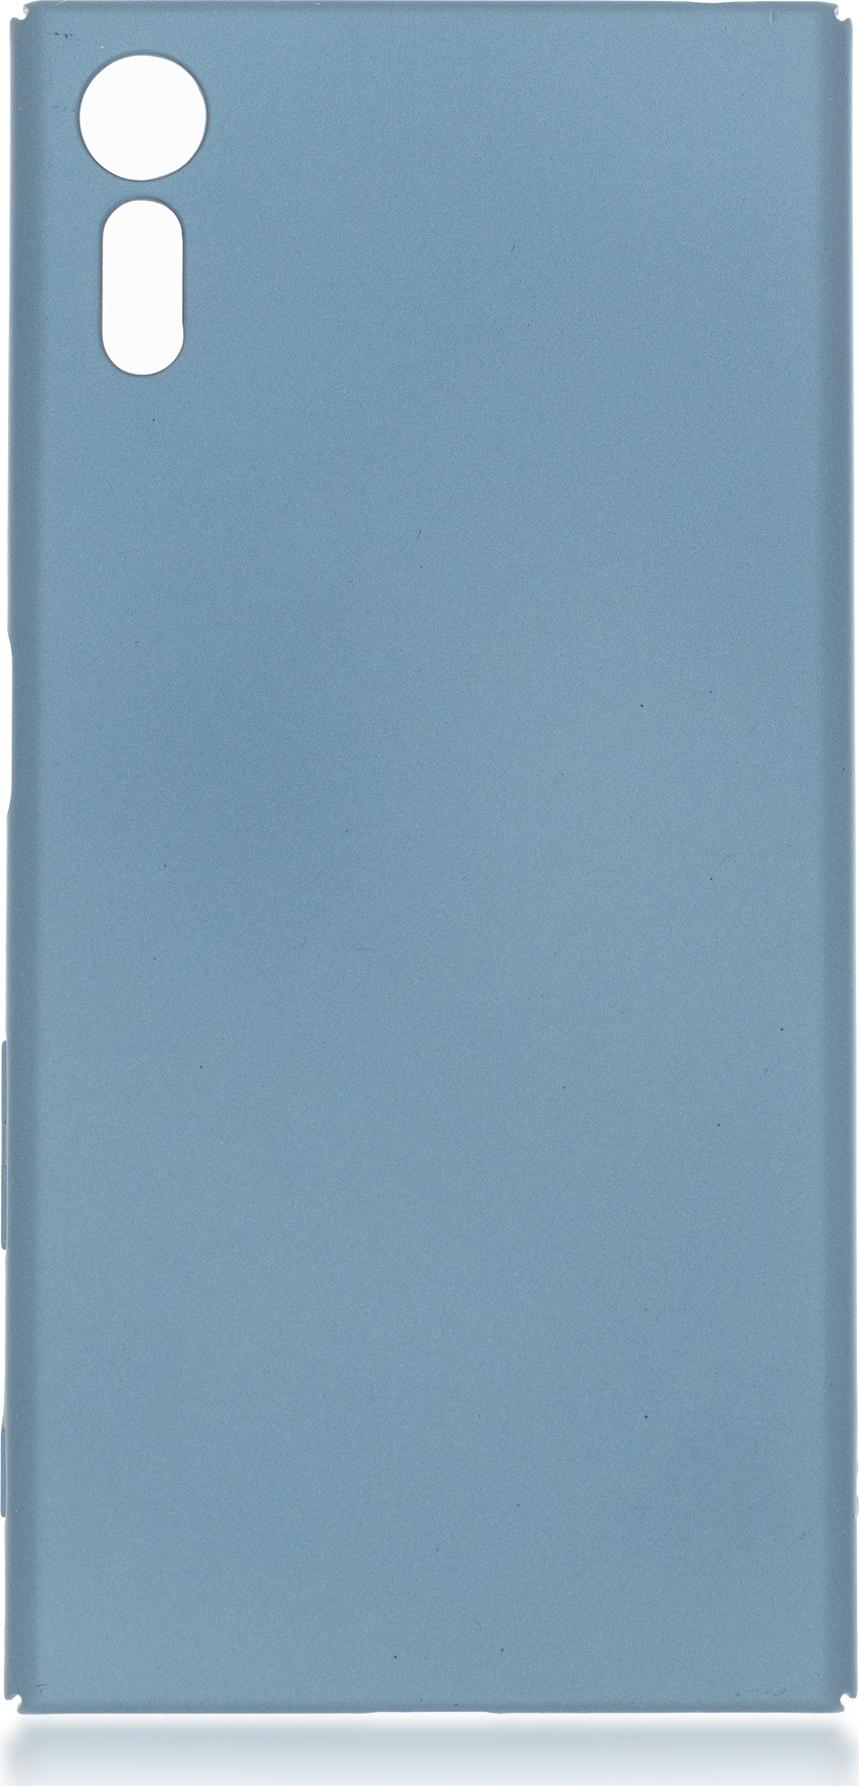 Чехол Brosco 4Side Soft-Touch для Sony Xperia XZs, голубой